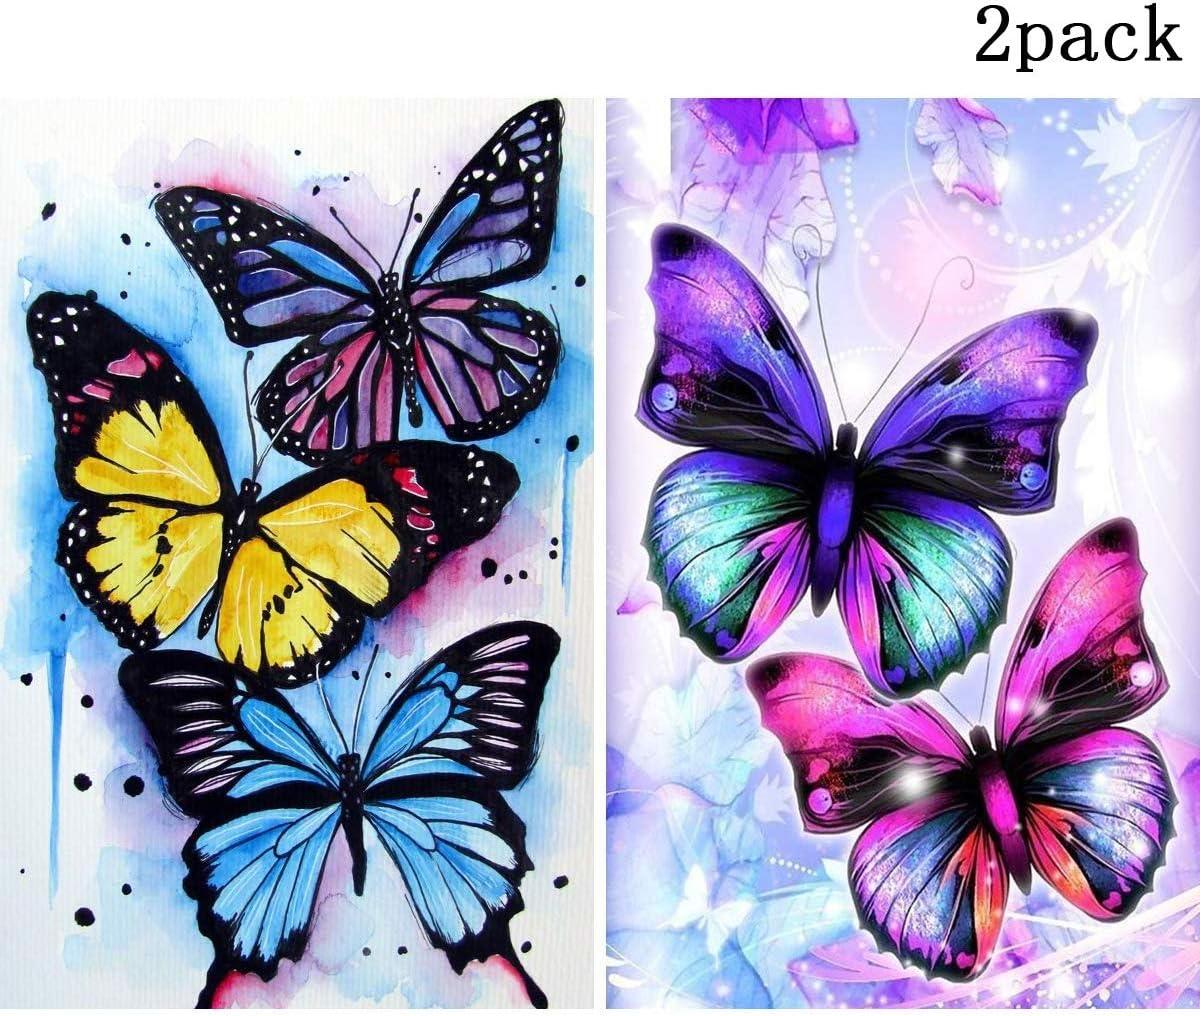 30 X 40 cm 2 Paquetes DIY 5D Diamond Painting,para Decoraci/ón de la Pared del Hogar Sancuanyi 5D DIY Pintura Diamantes